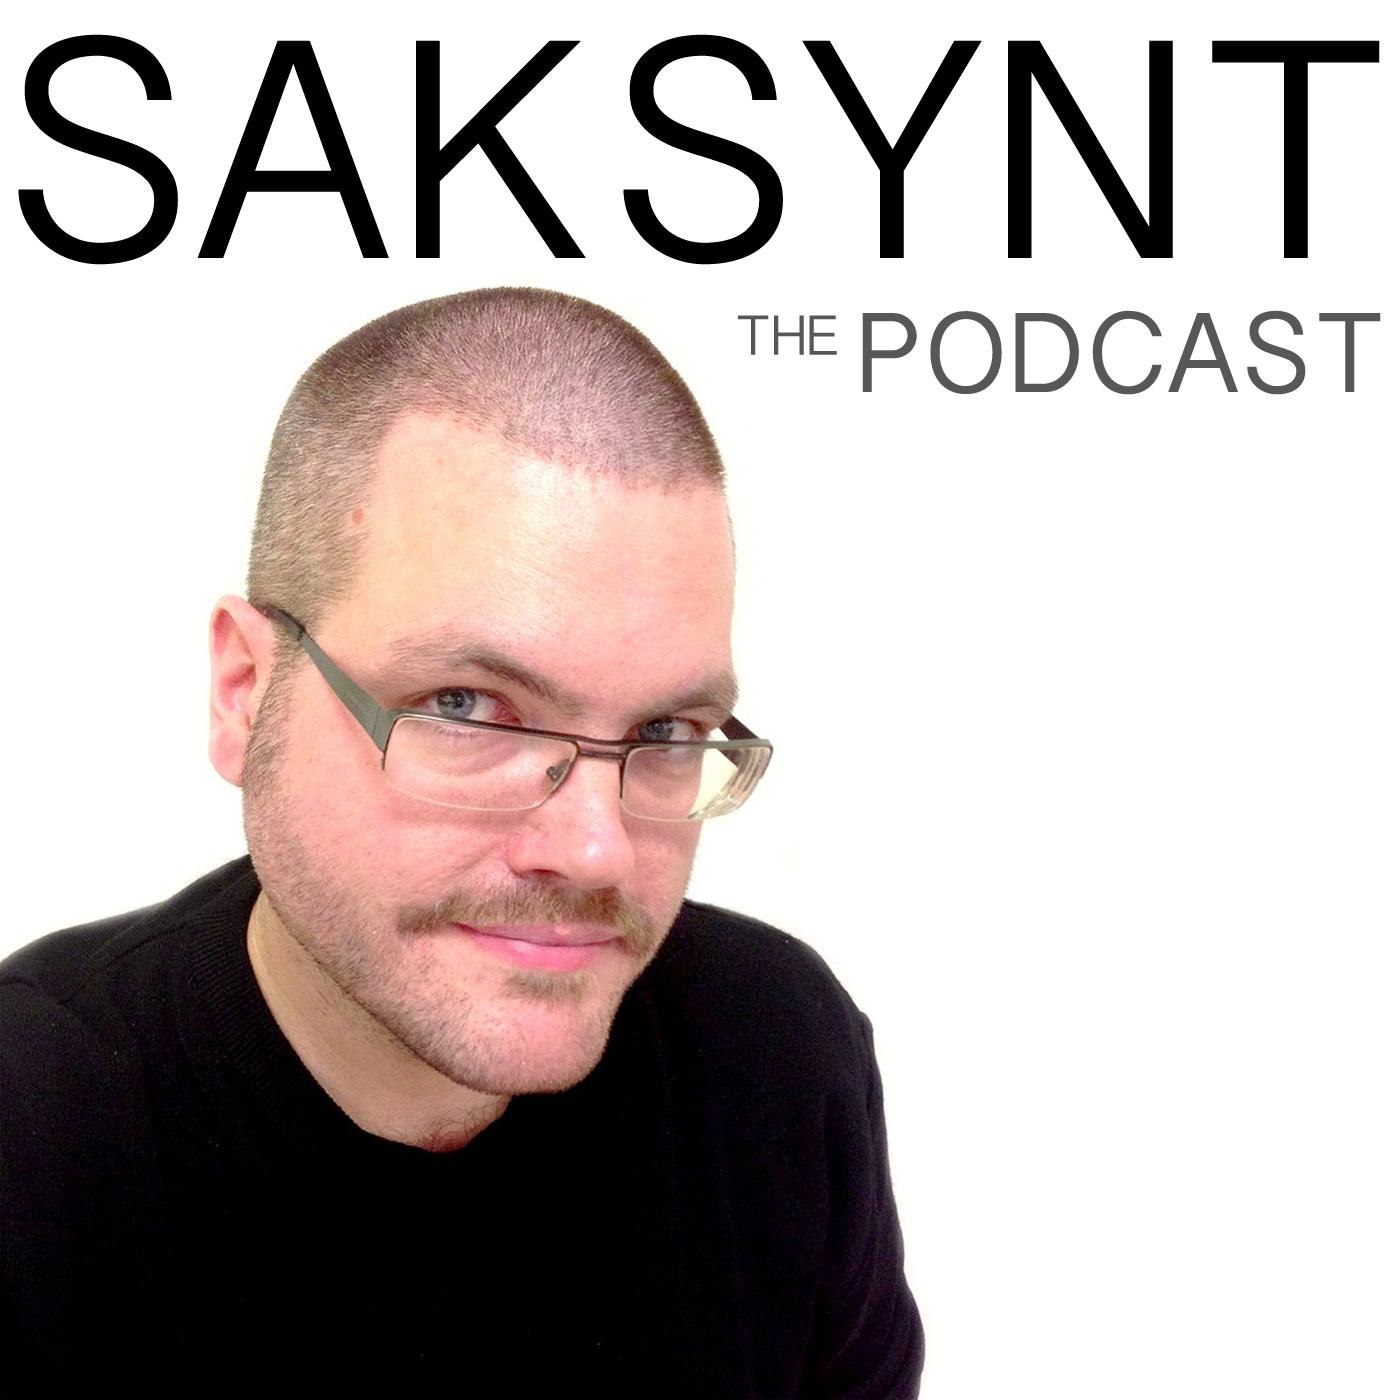 SAKSYNT - The Podcast